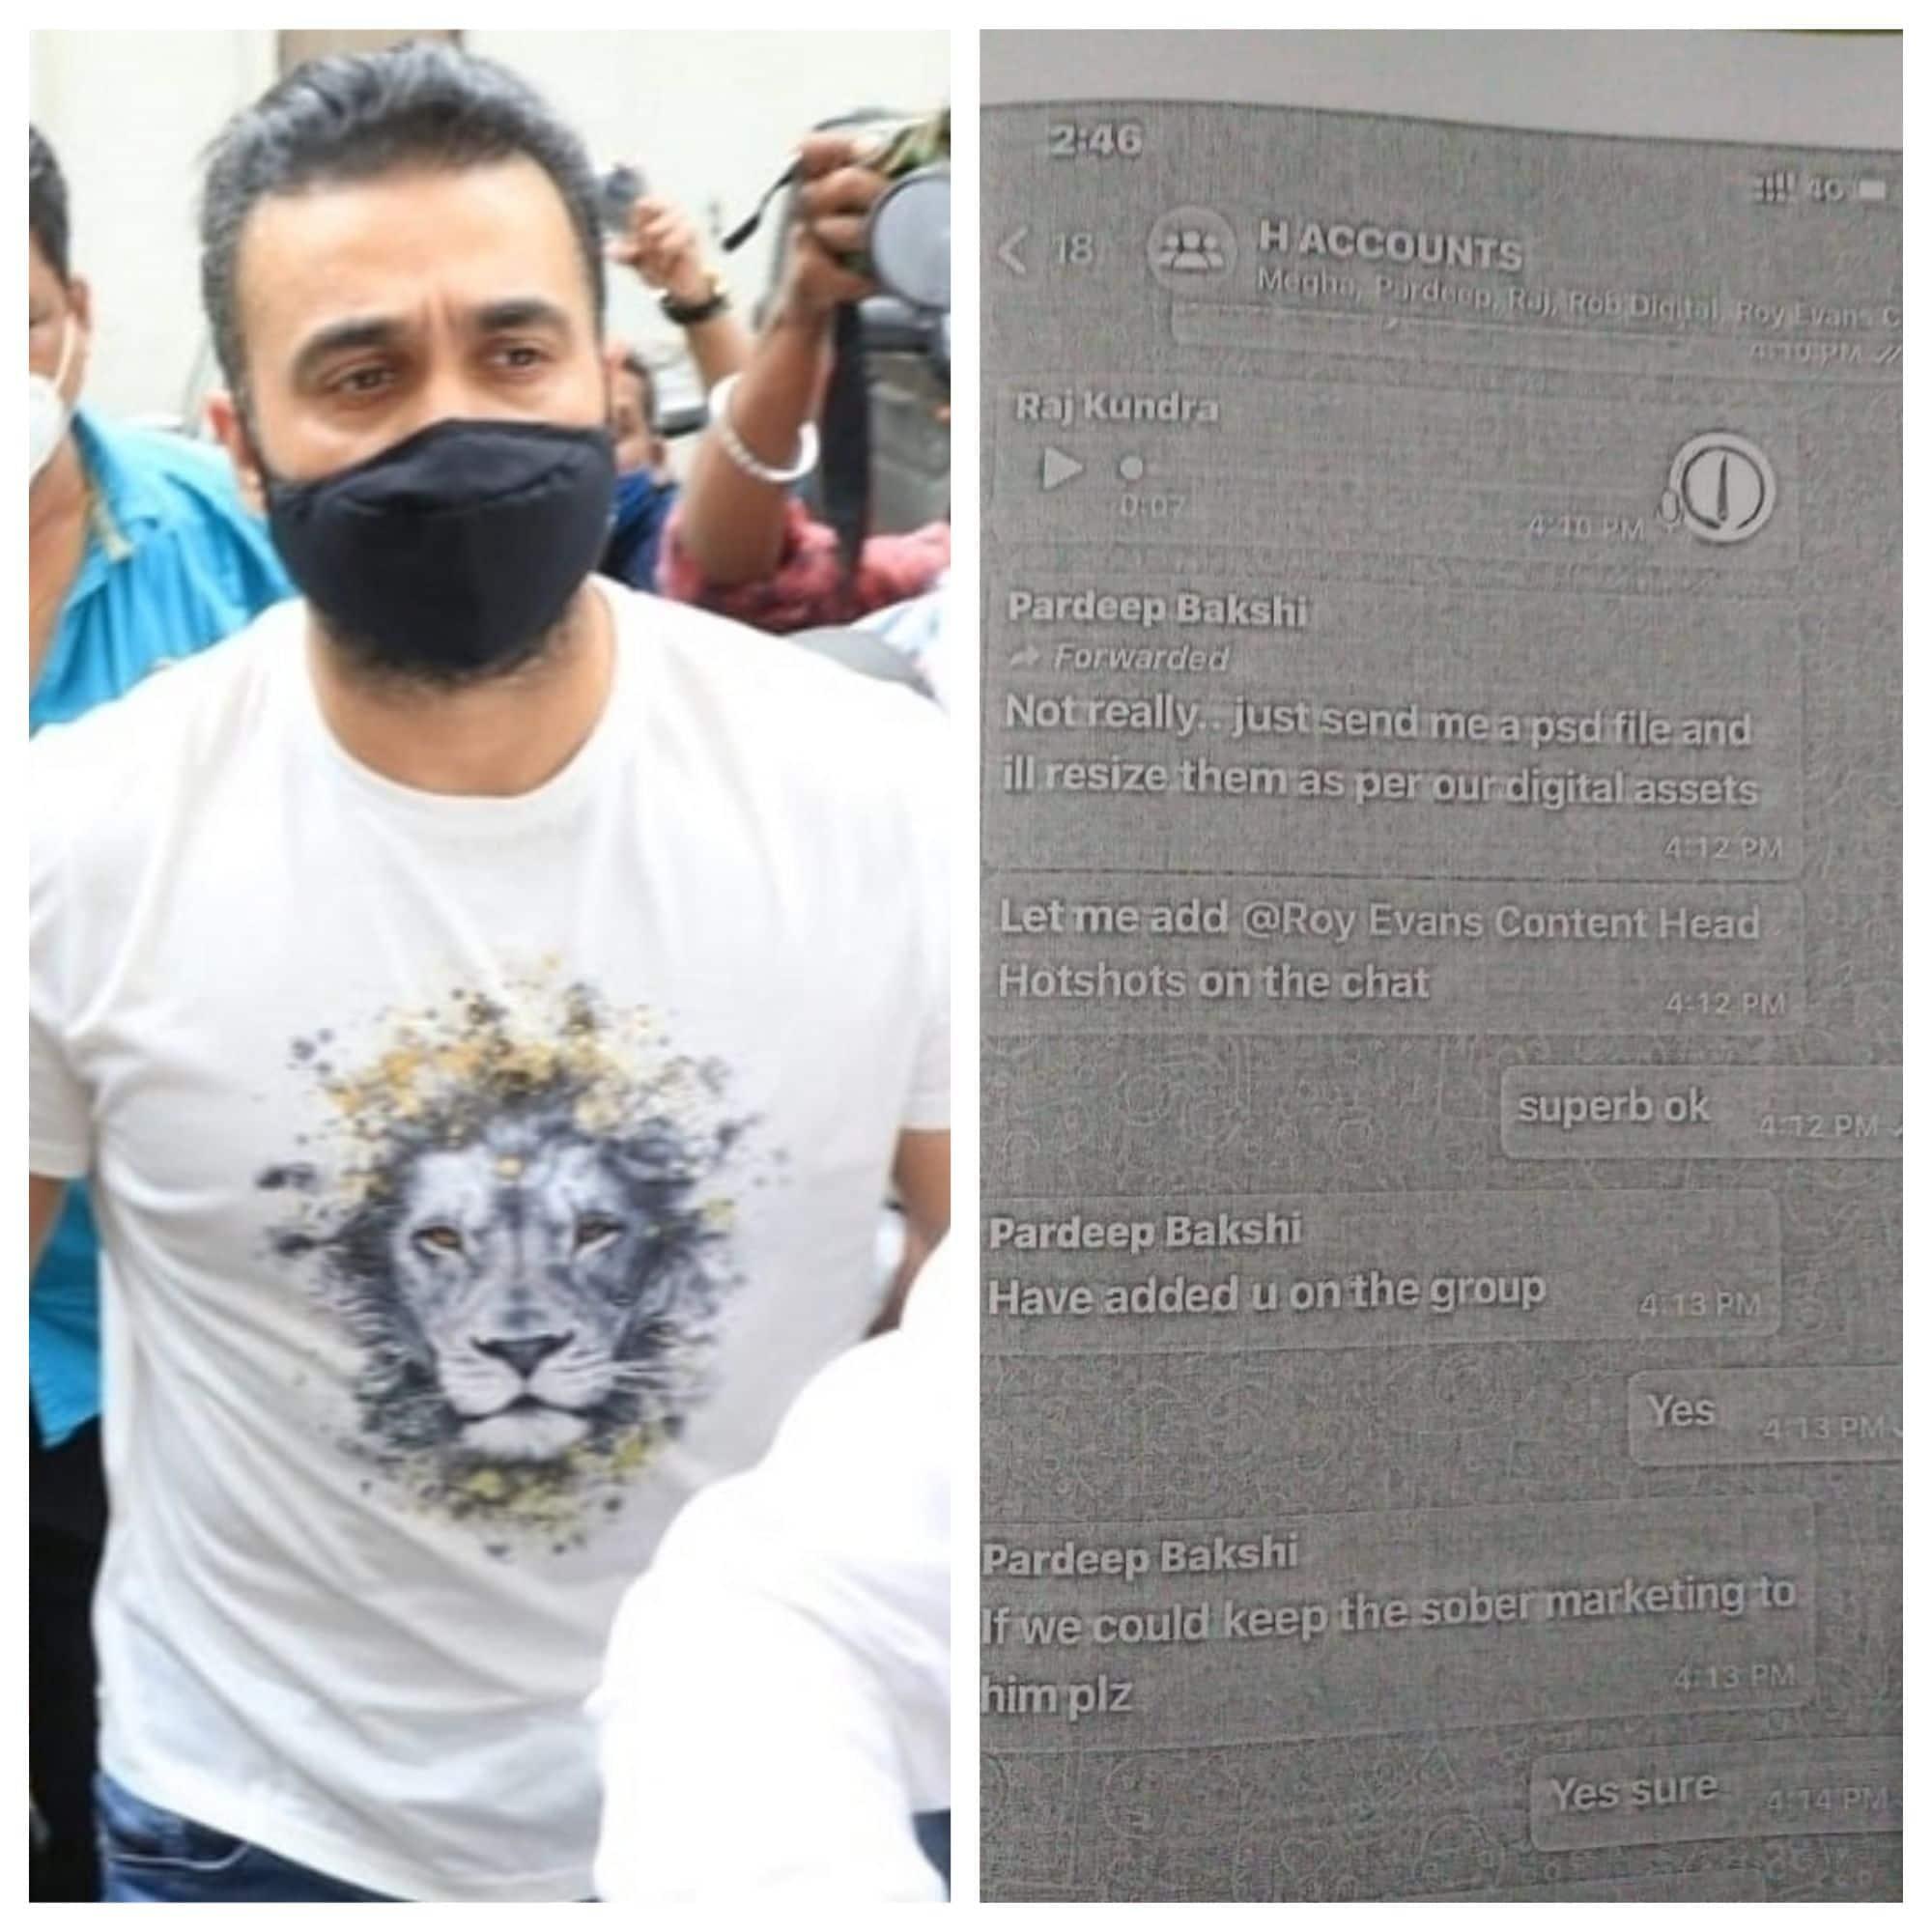 पोर्नोग्राफी आरोपी Raj Kundra की व्हाट्सएफ चैट हुई लीक